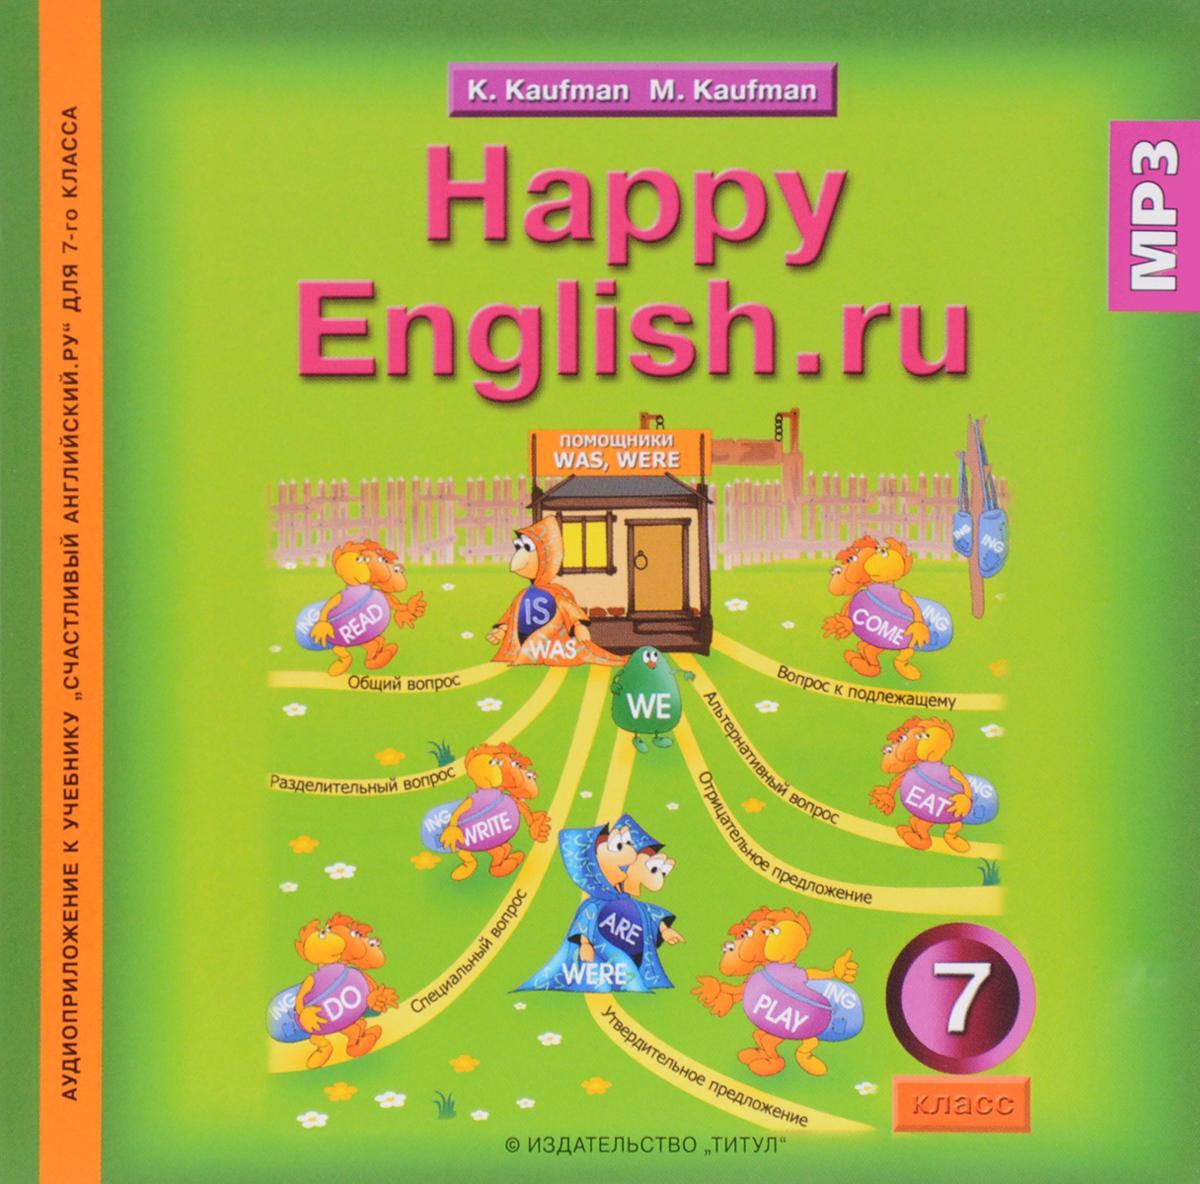 Happy English.ru 7 / Английский язык. 7 класс (аудиокурс MP3) кочергина в к hauskasti suomea финский язык для школьников книга 1 аудиокурс mp3